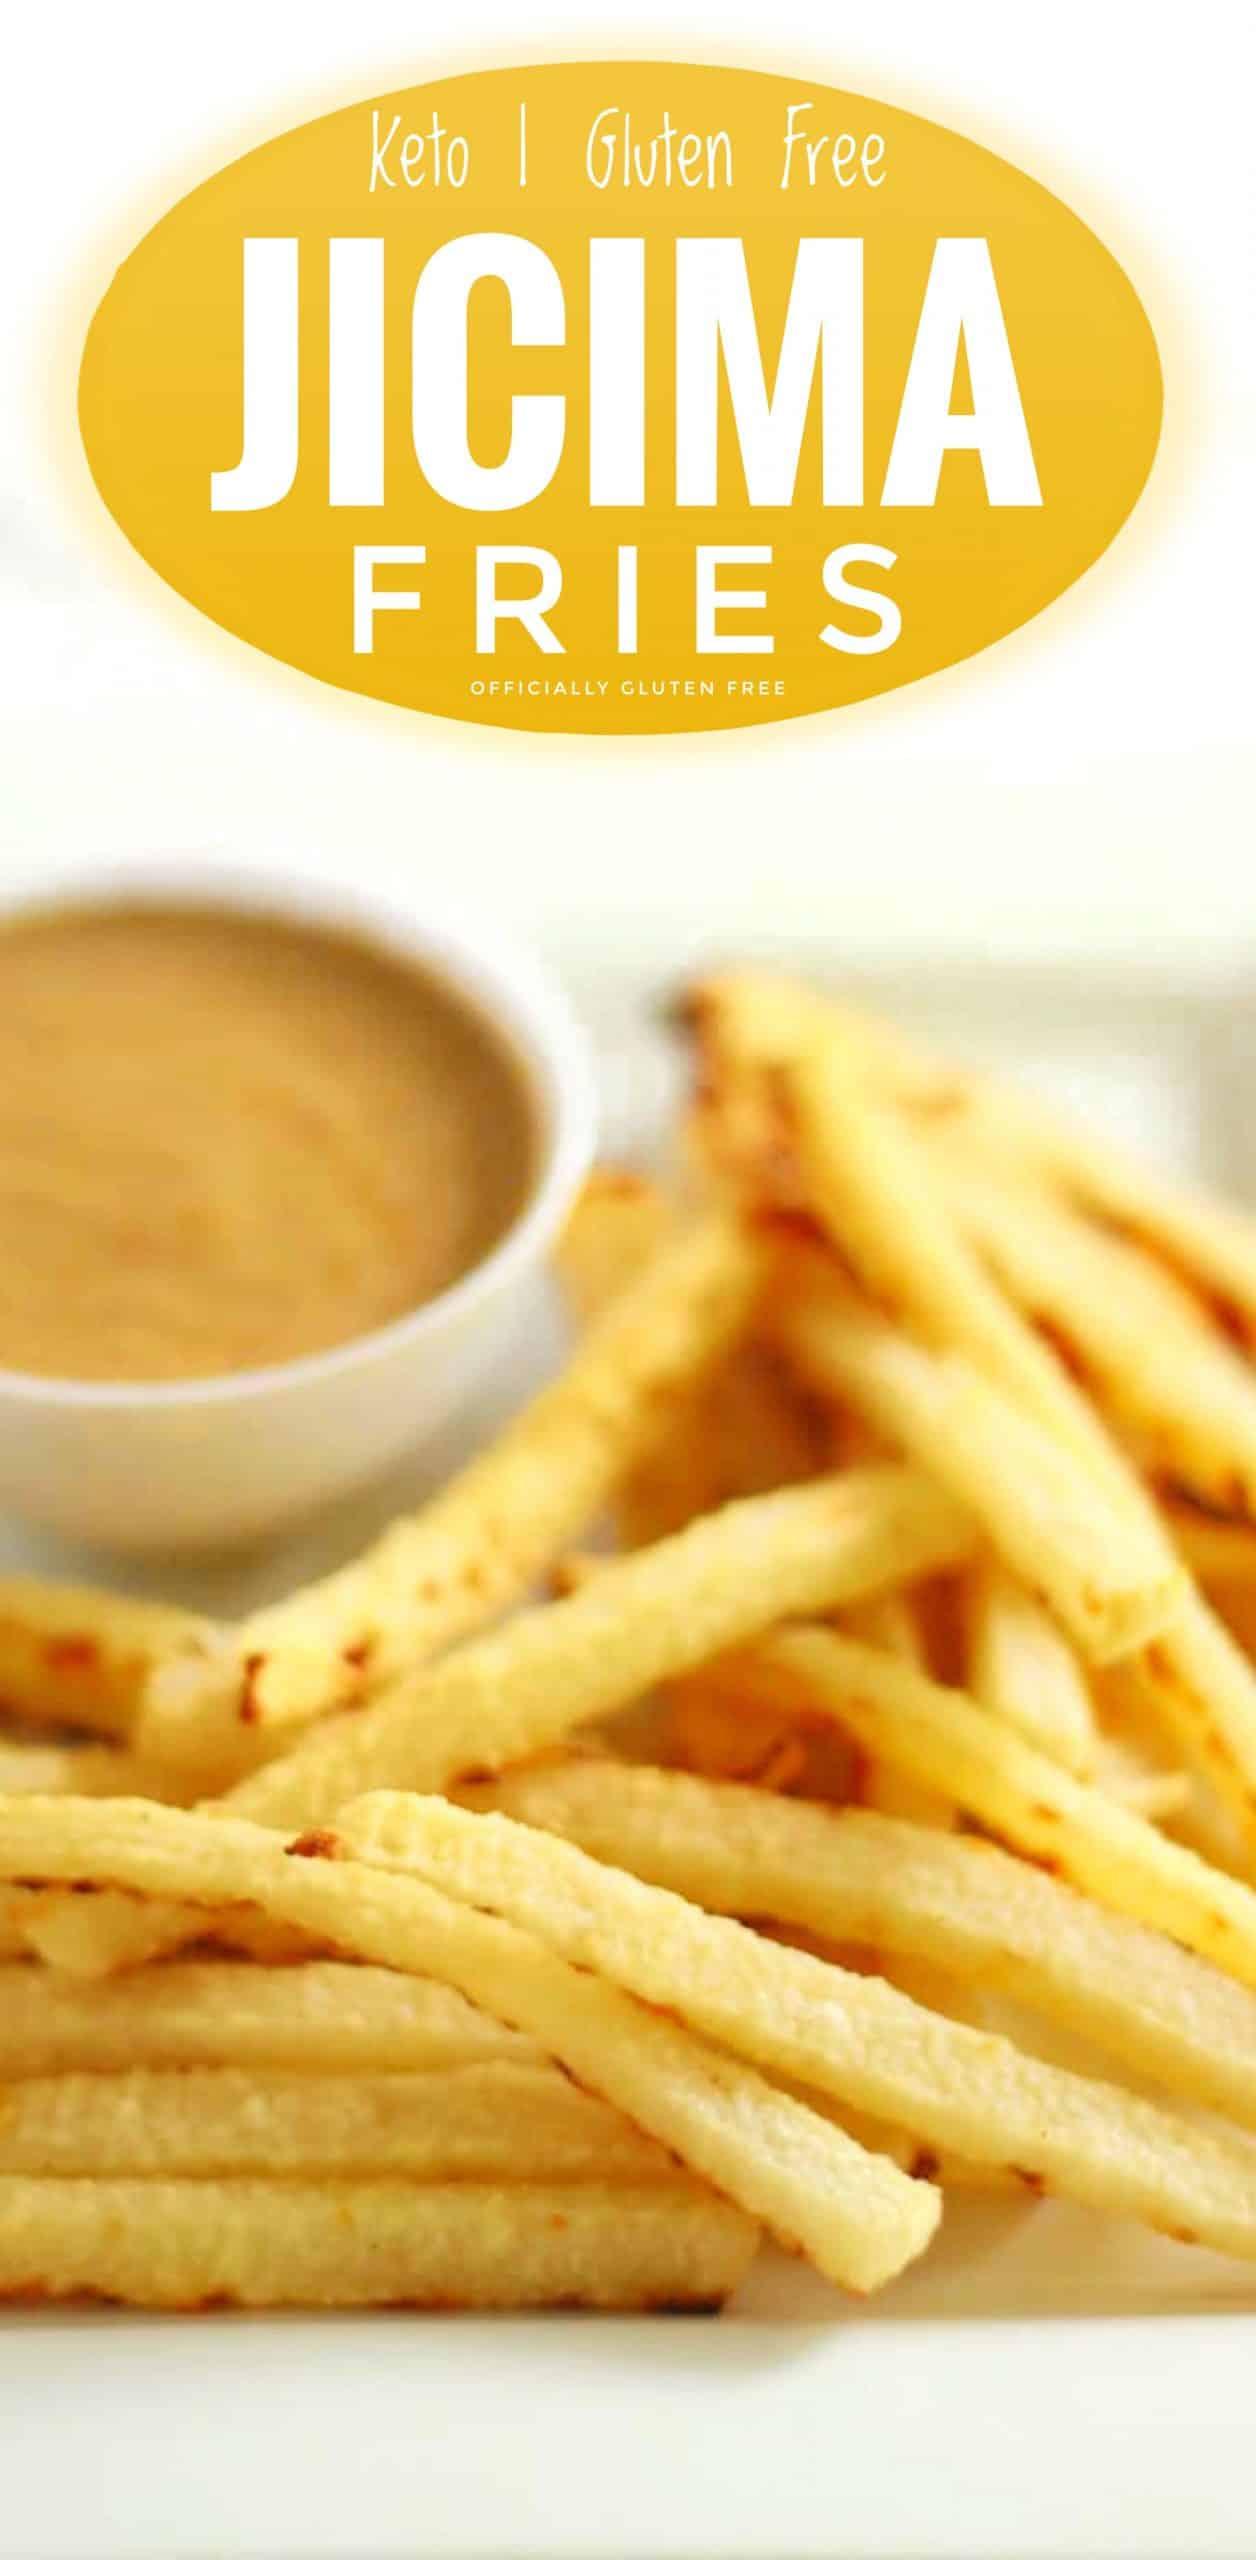 Baked Jicama Fries with Easy Keto Gravy